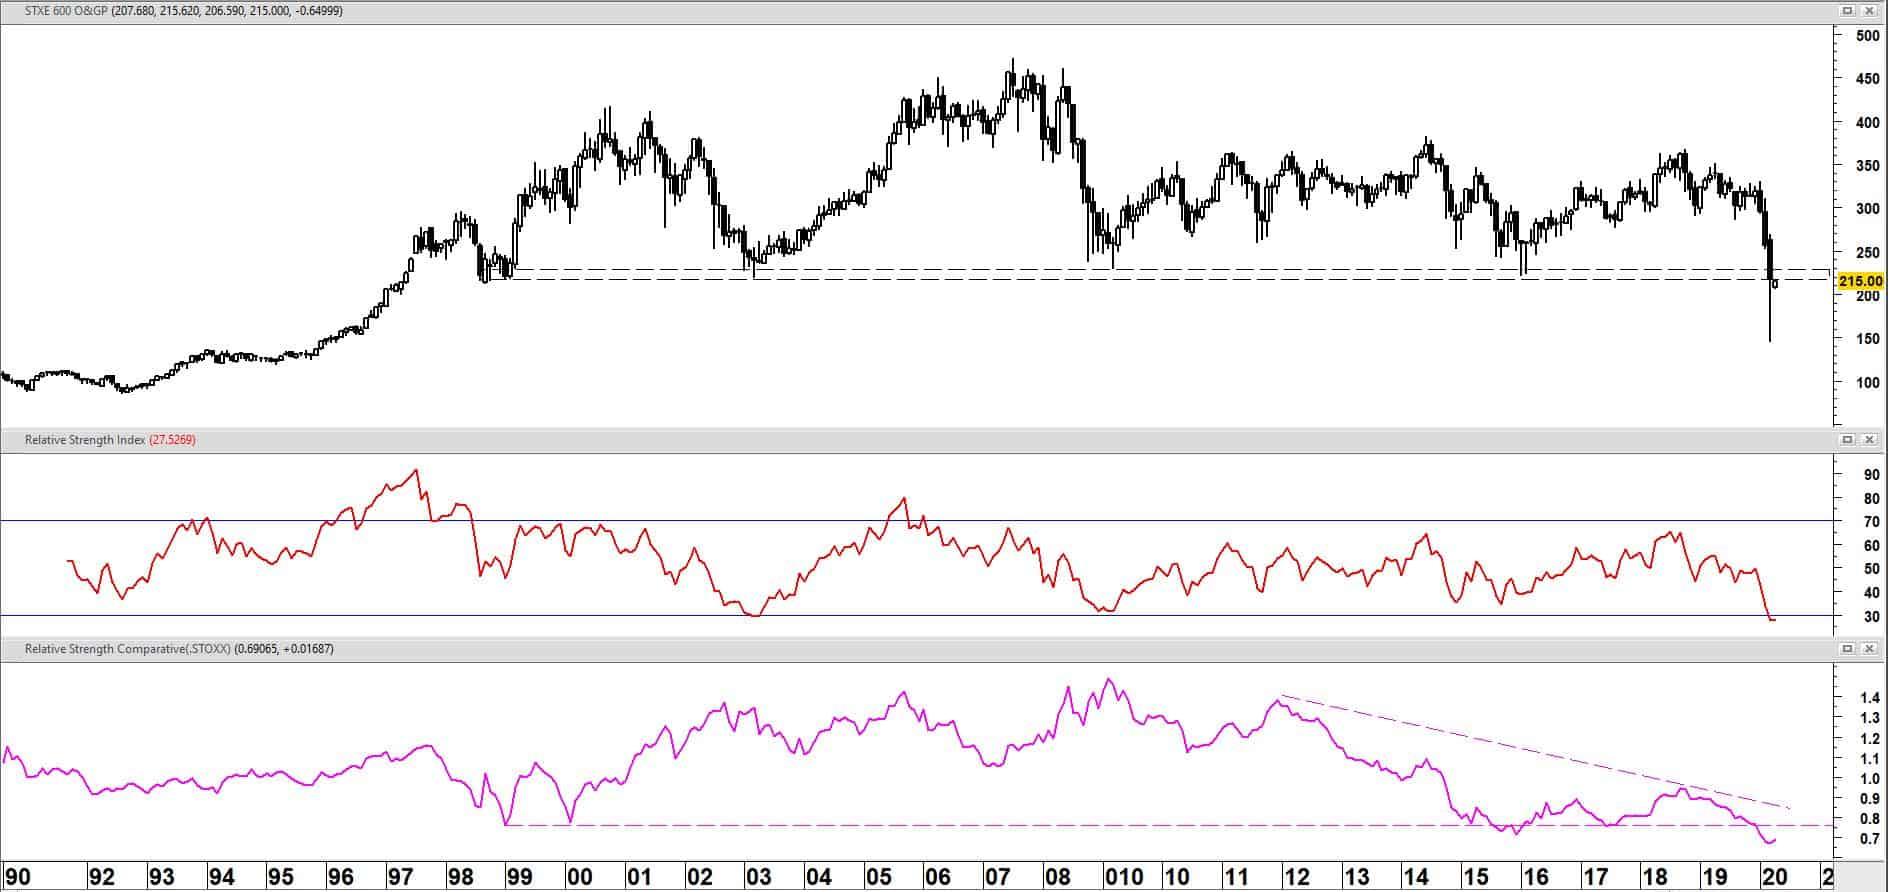 Europese DJ Stoxx 600 Oil & Gas sector (SXEP) op maandbasis + RSI(14) + relatieve sterkte vs DJ-600